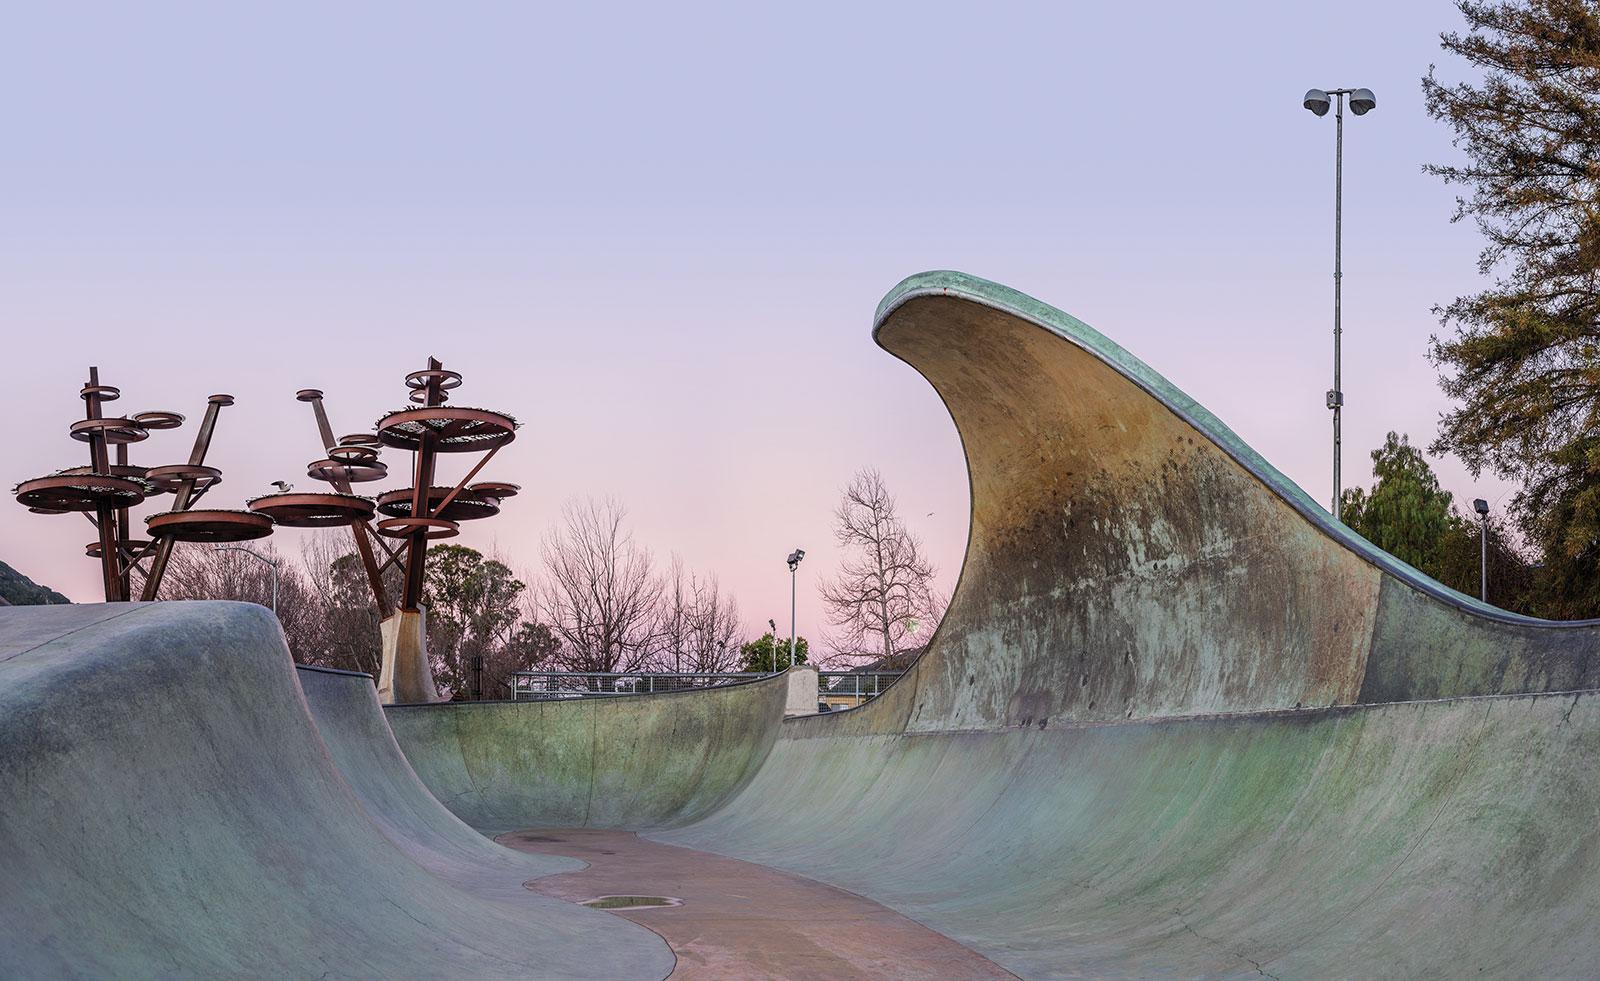 Californias concrete skateparks photographed by Amir Zaki 1600x981